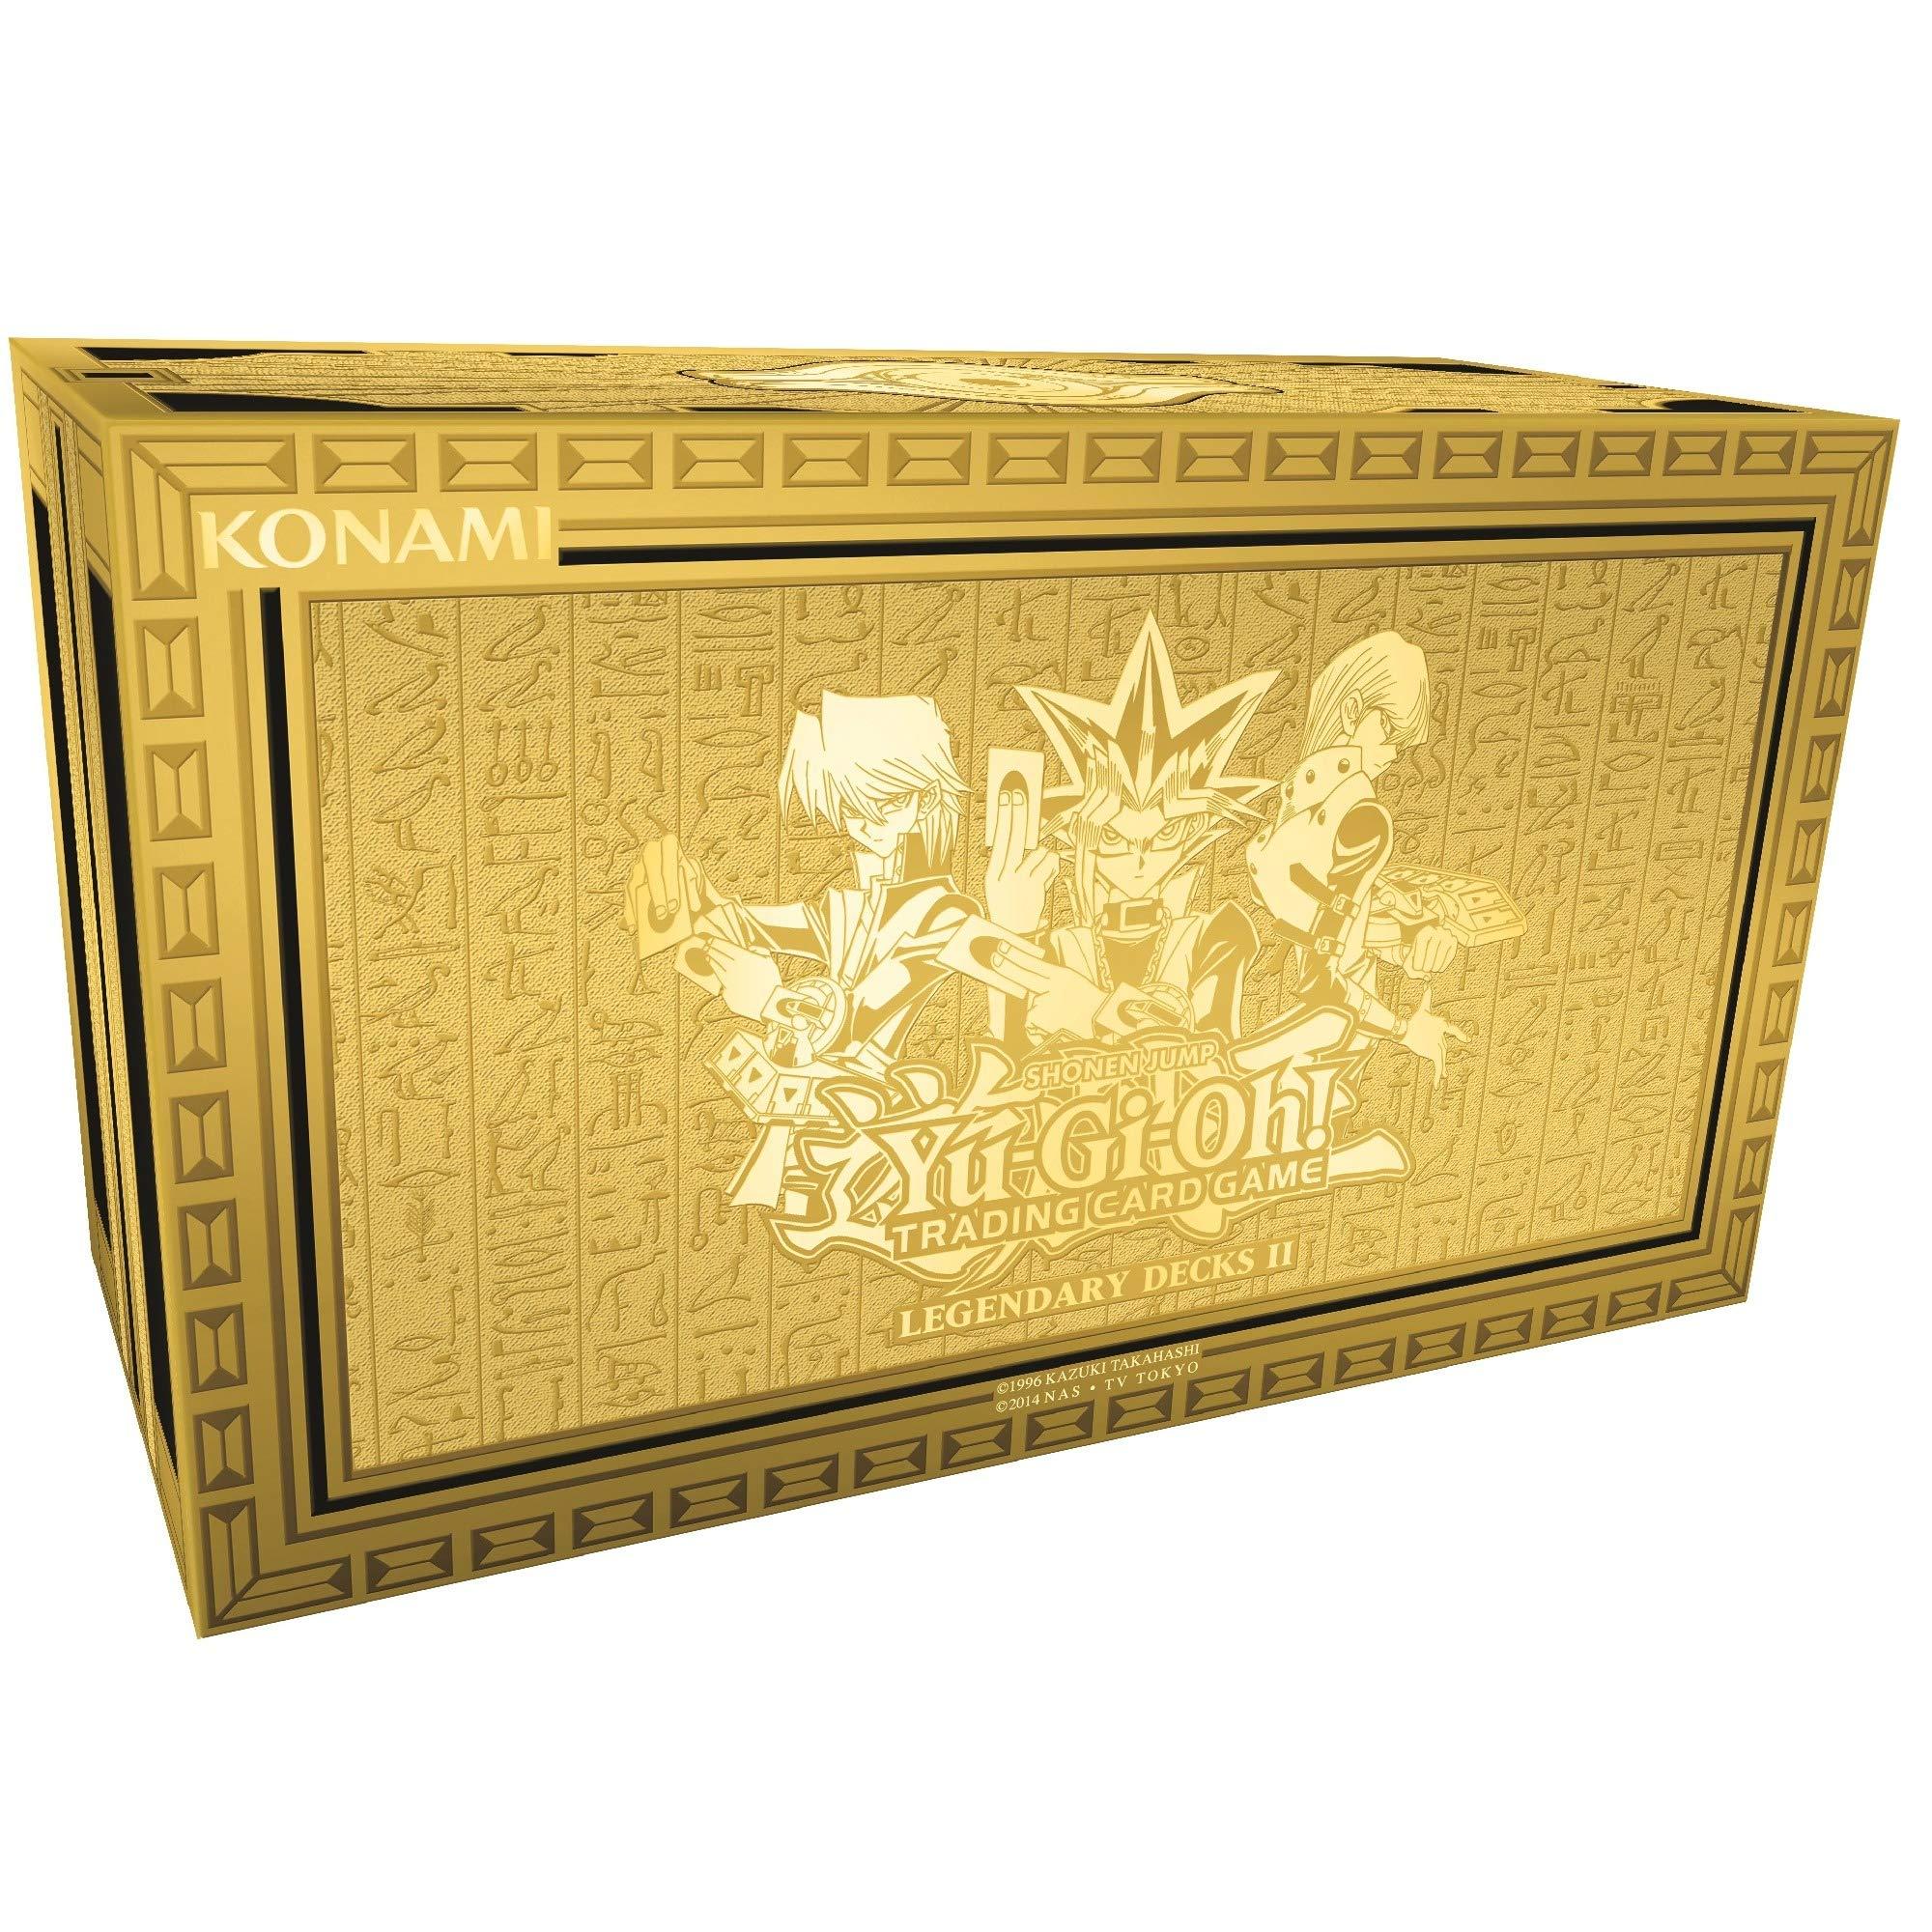 YU-GI-OH! YGO-LD2-EN Legendary Decks II Box Set